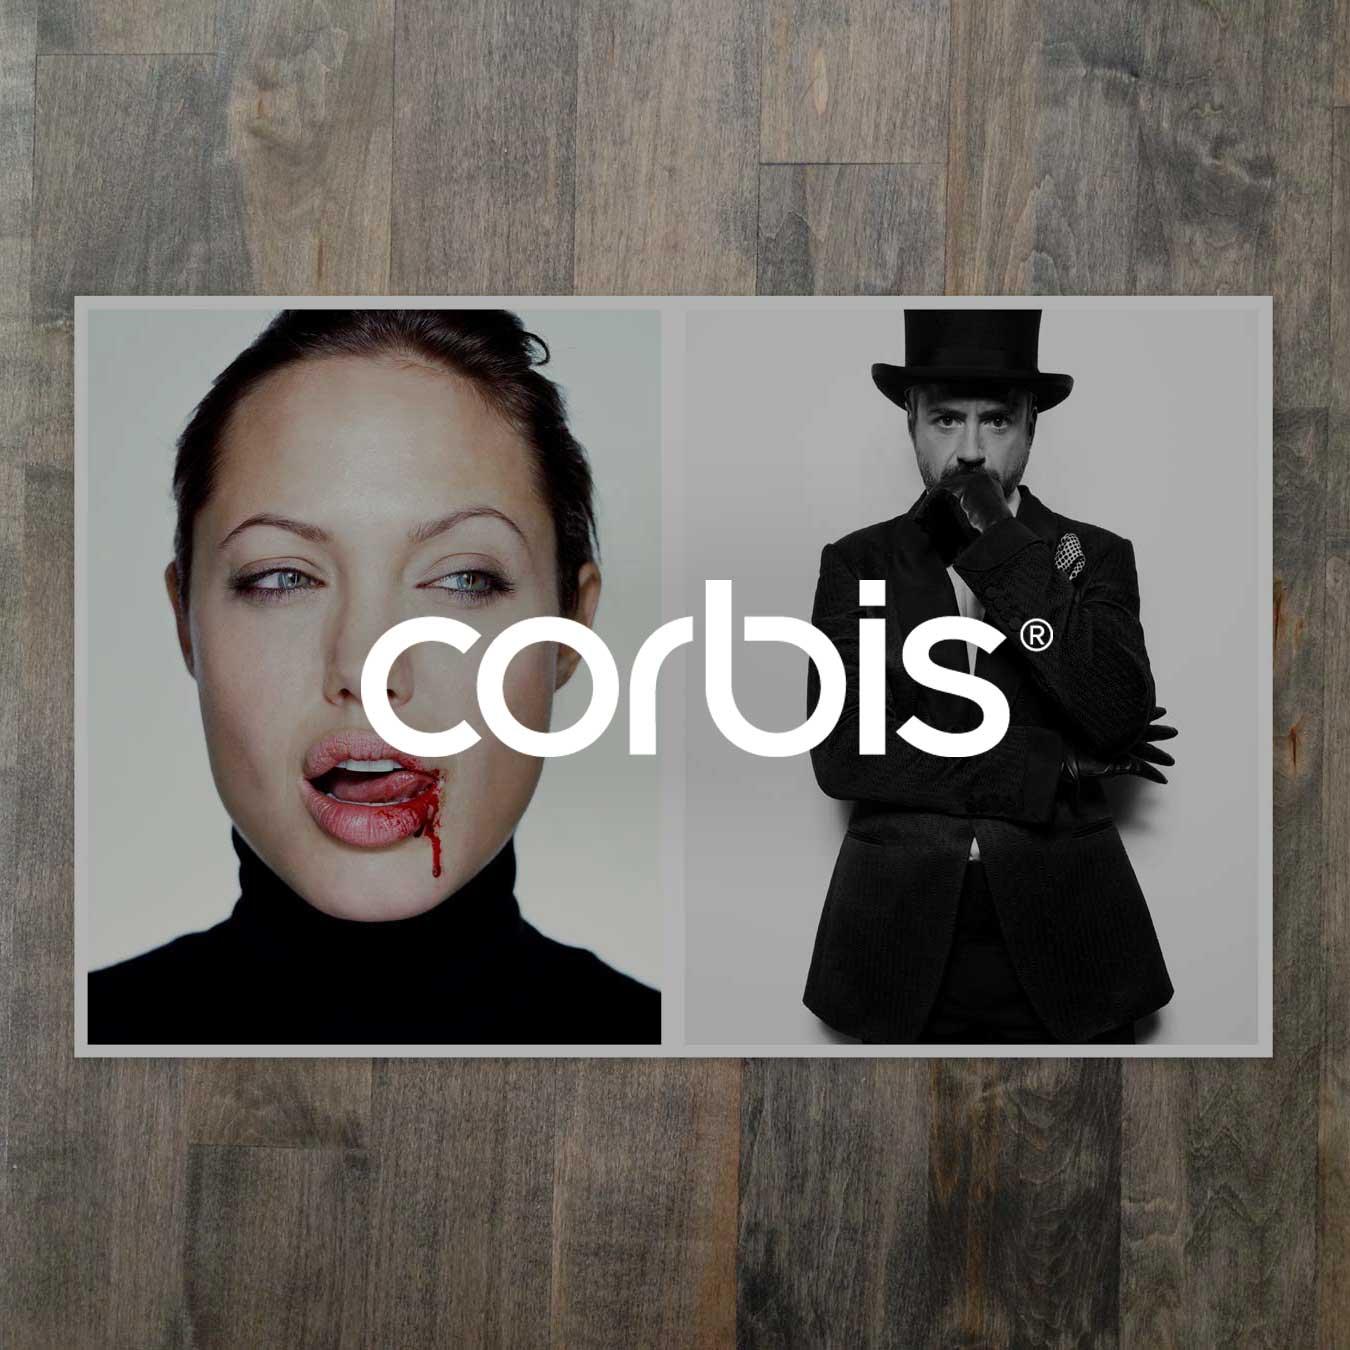 corbis-never-ordinary-square-logo.jpg